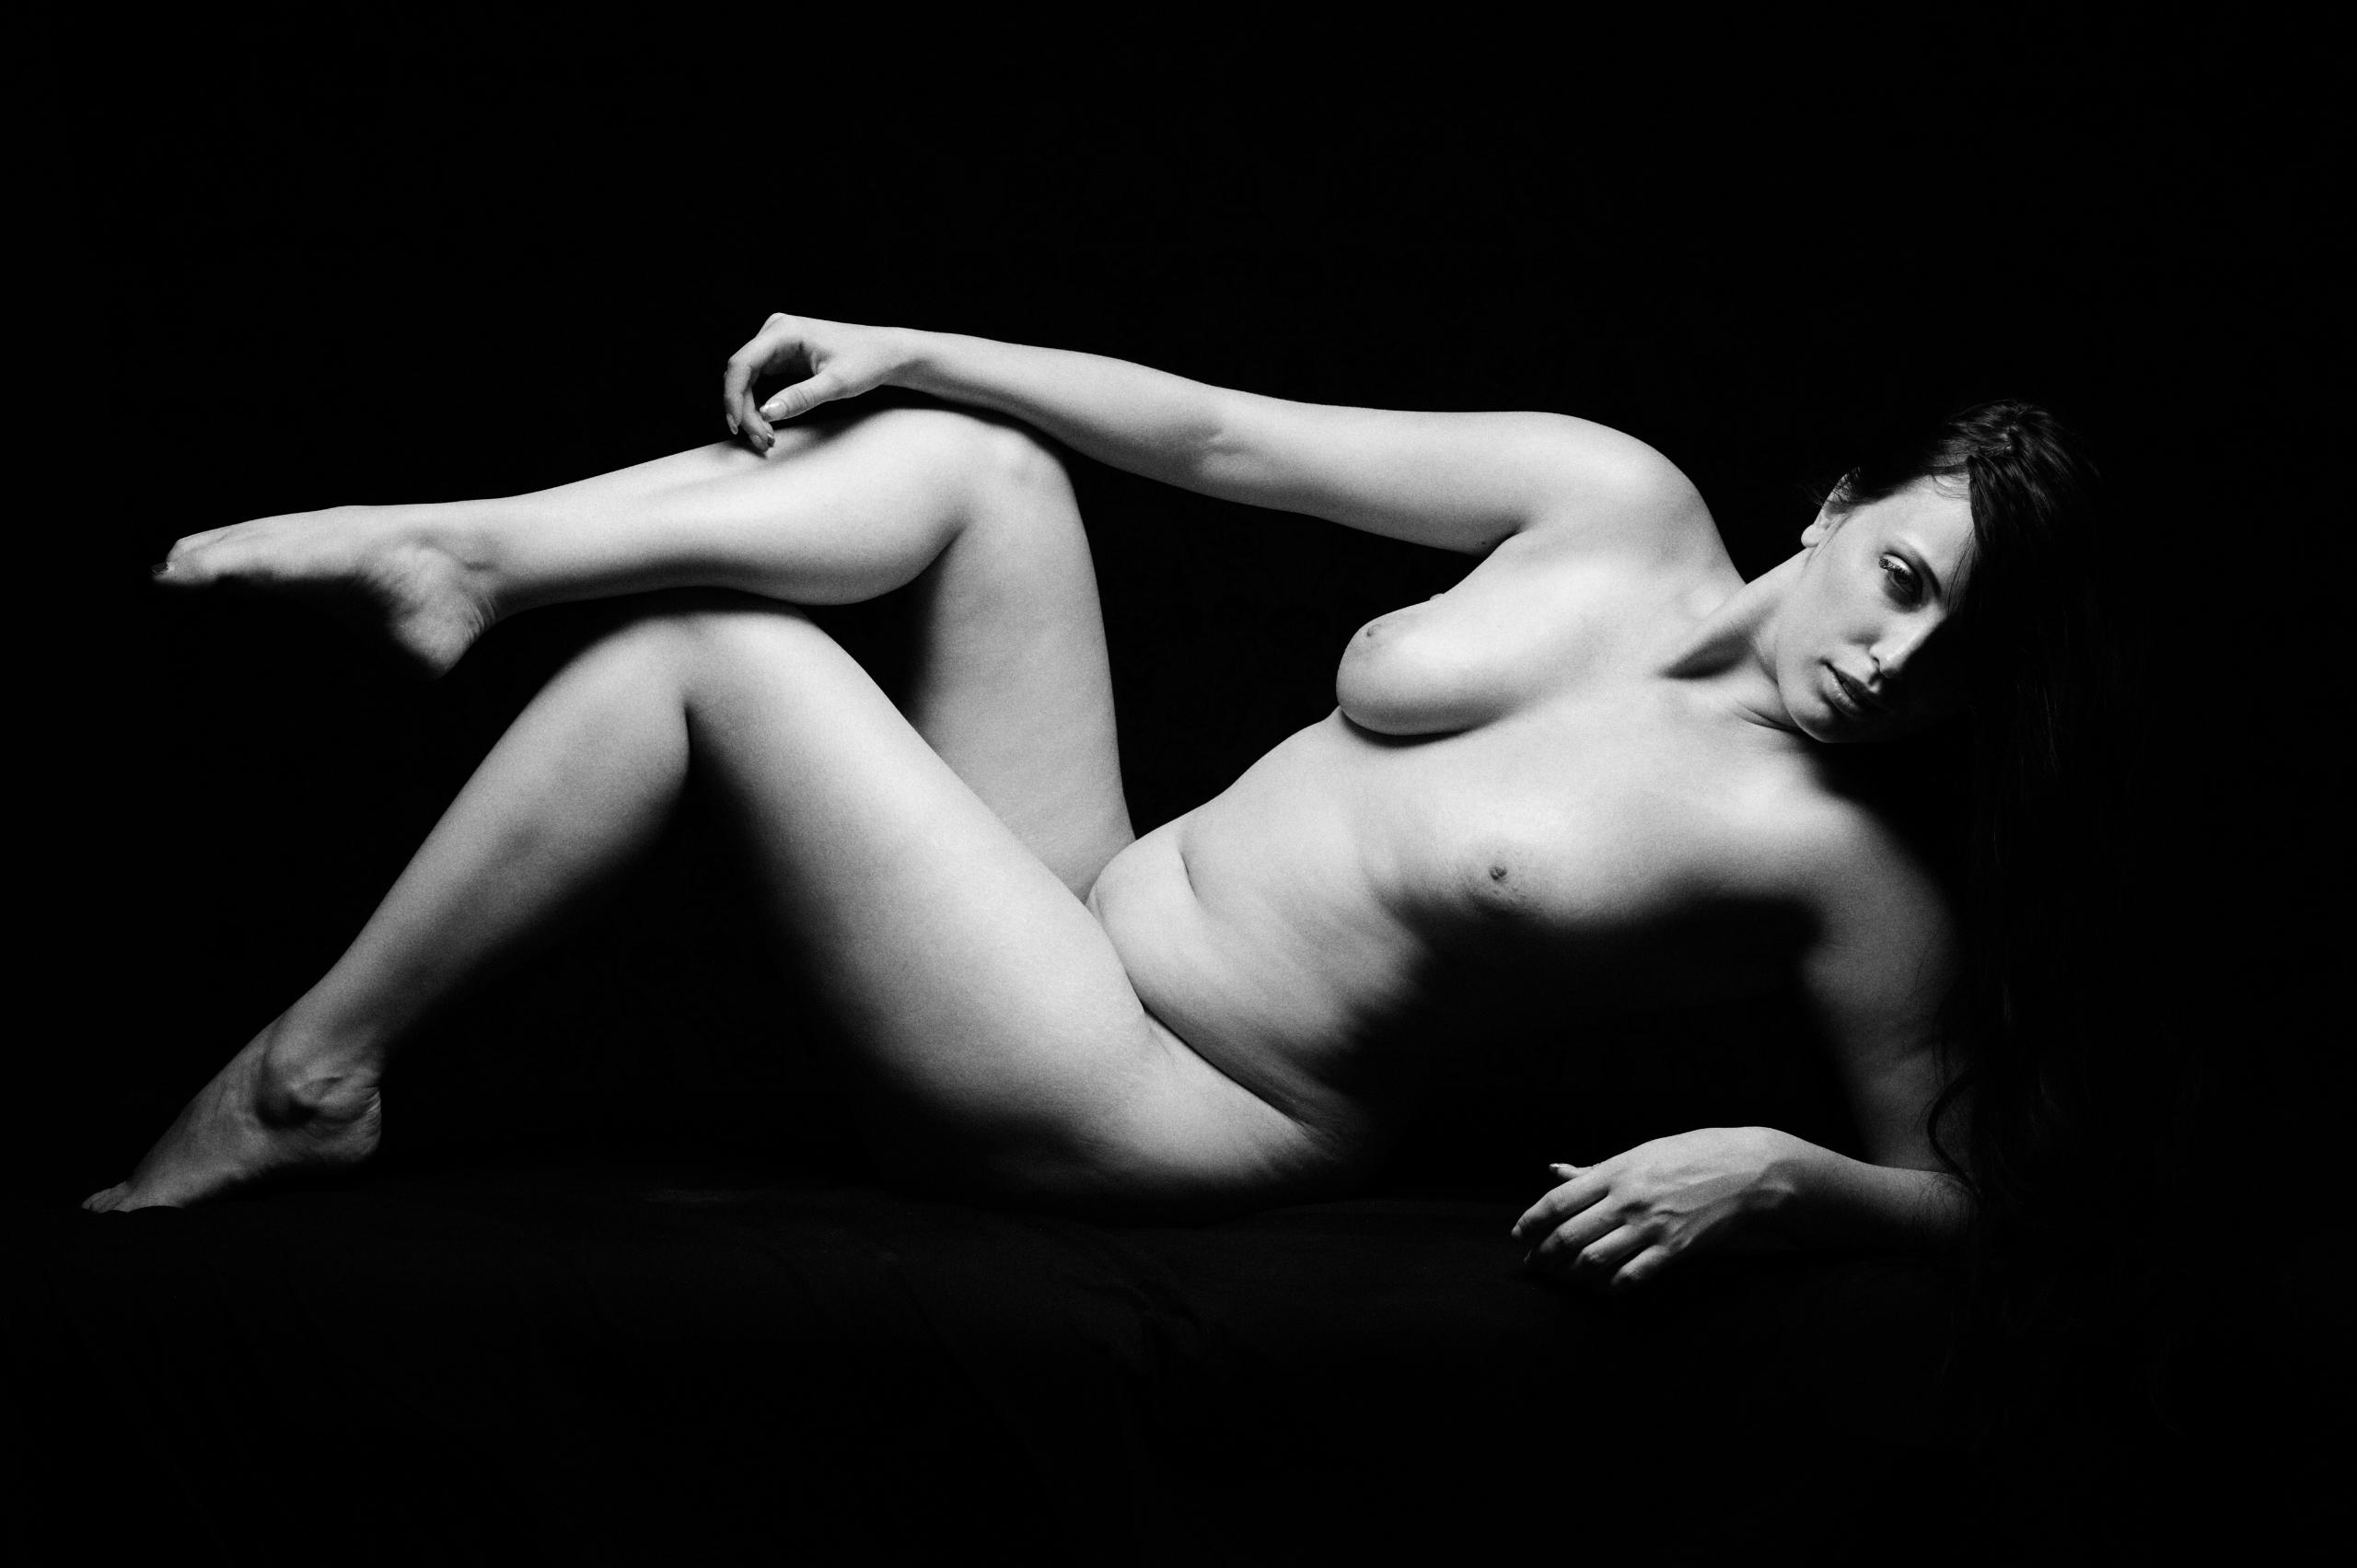 Artistic Nude, Cat Sanchez - 20 - thebodyphotography   ello